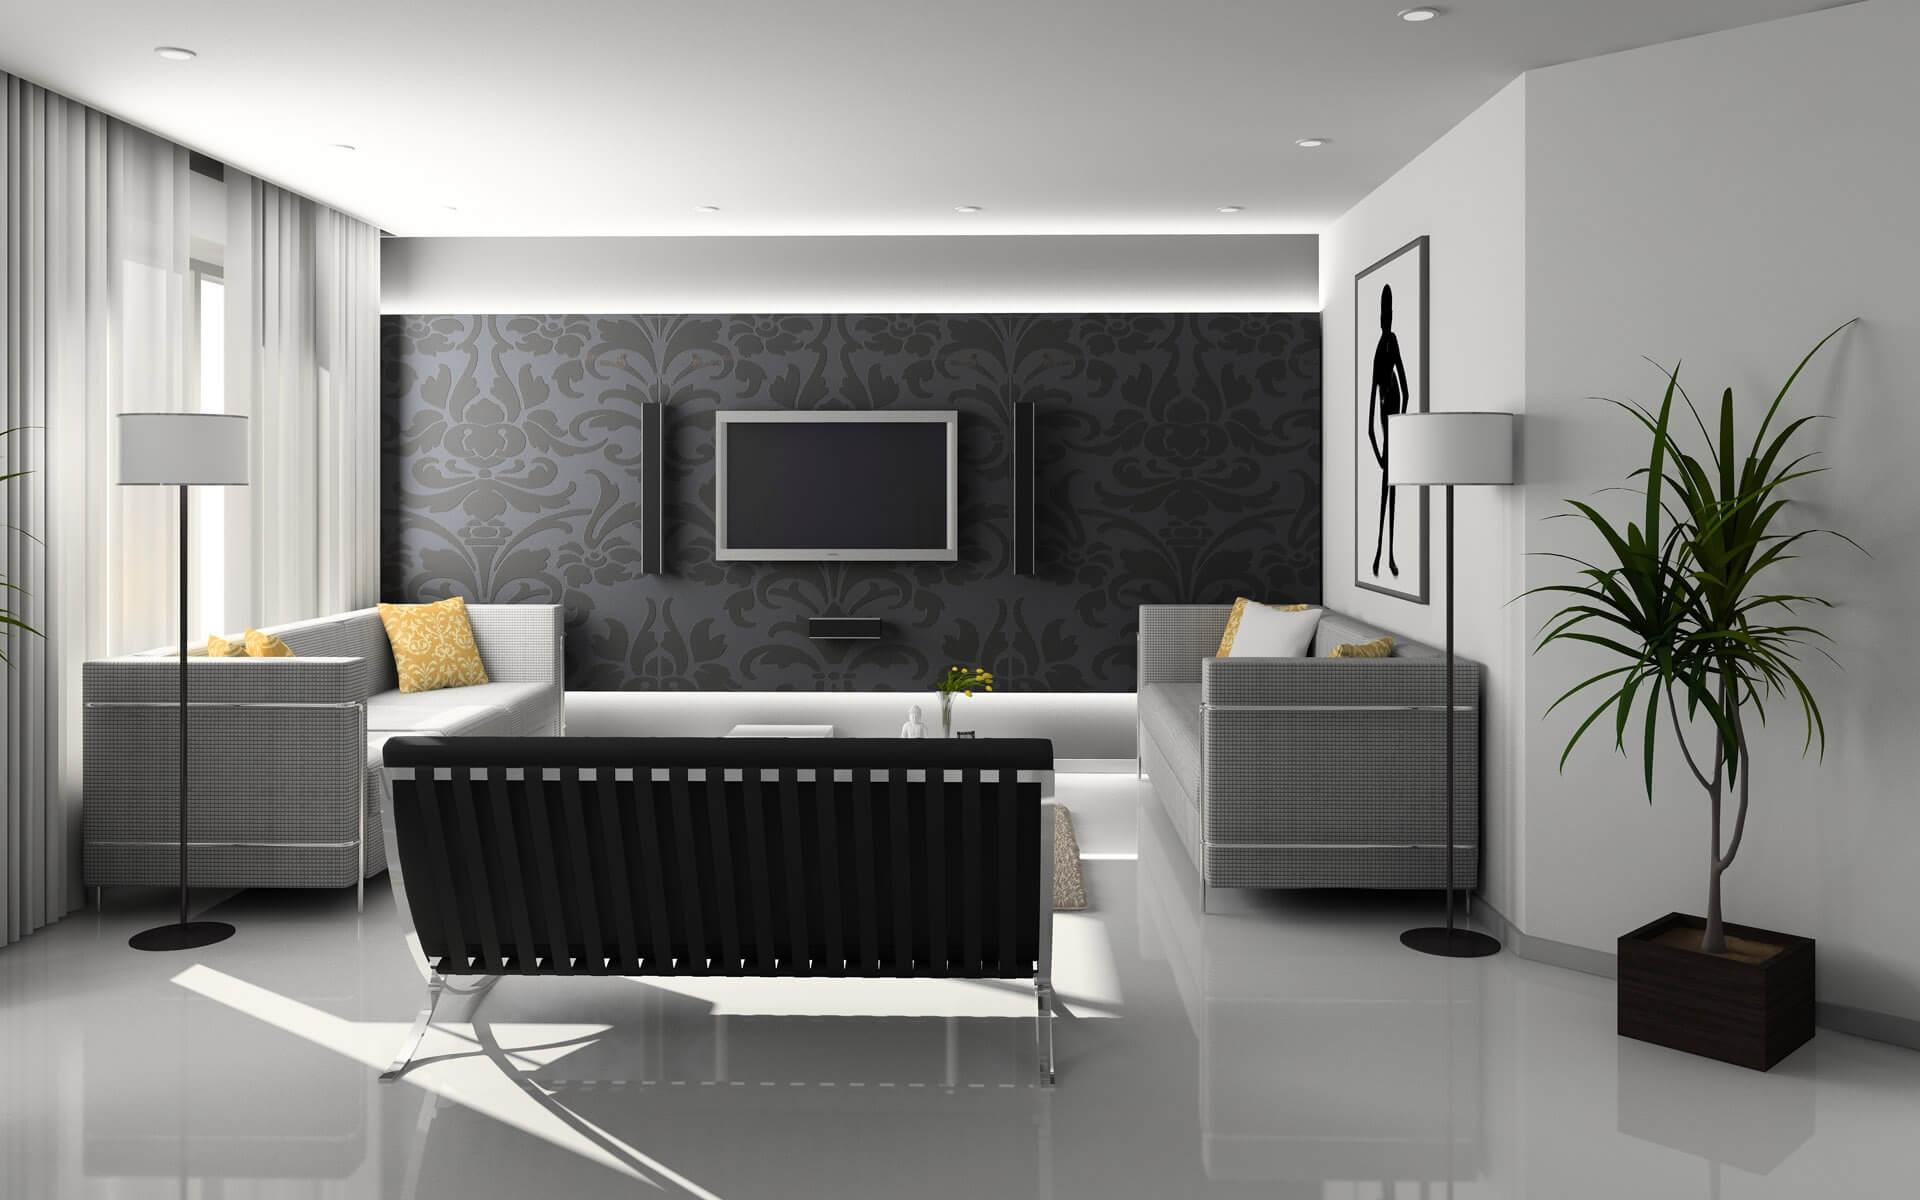 Urbanclap Will Bring You The Best Interior Designers In Mumbai Interior Design Design News And Architecture Trends